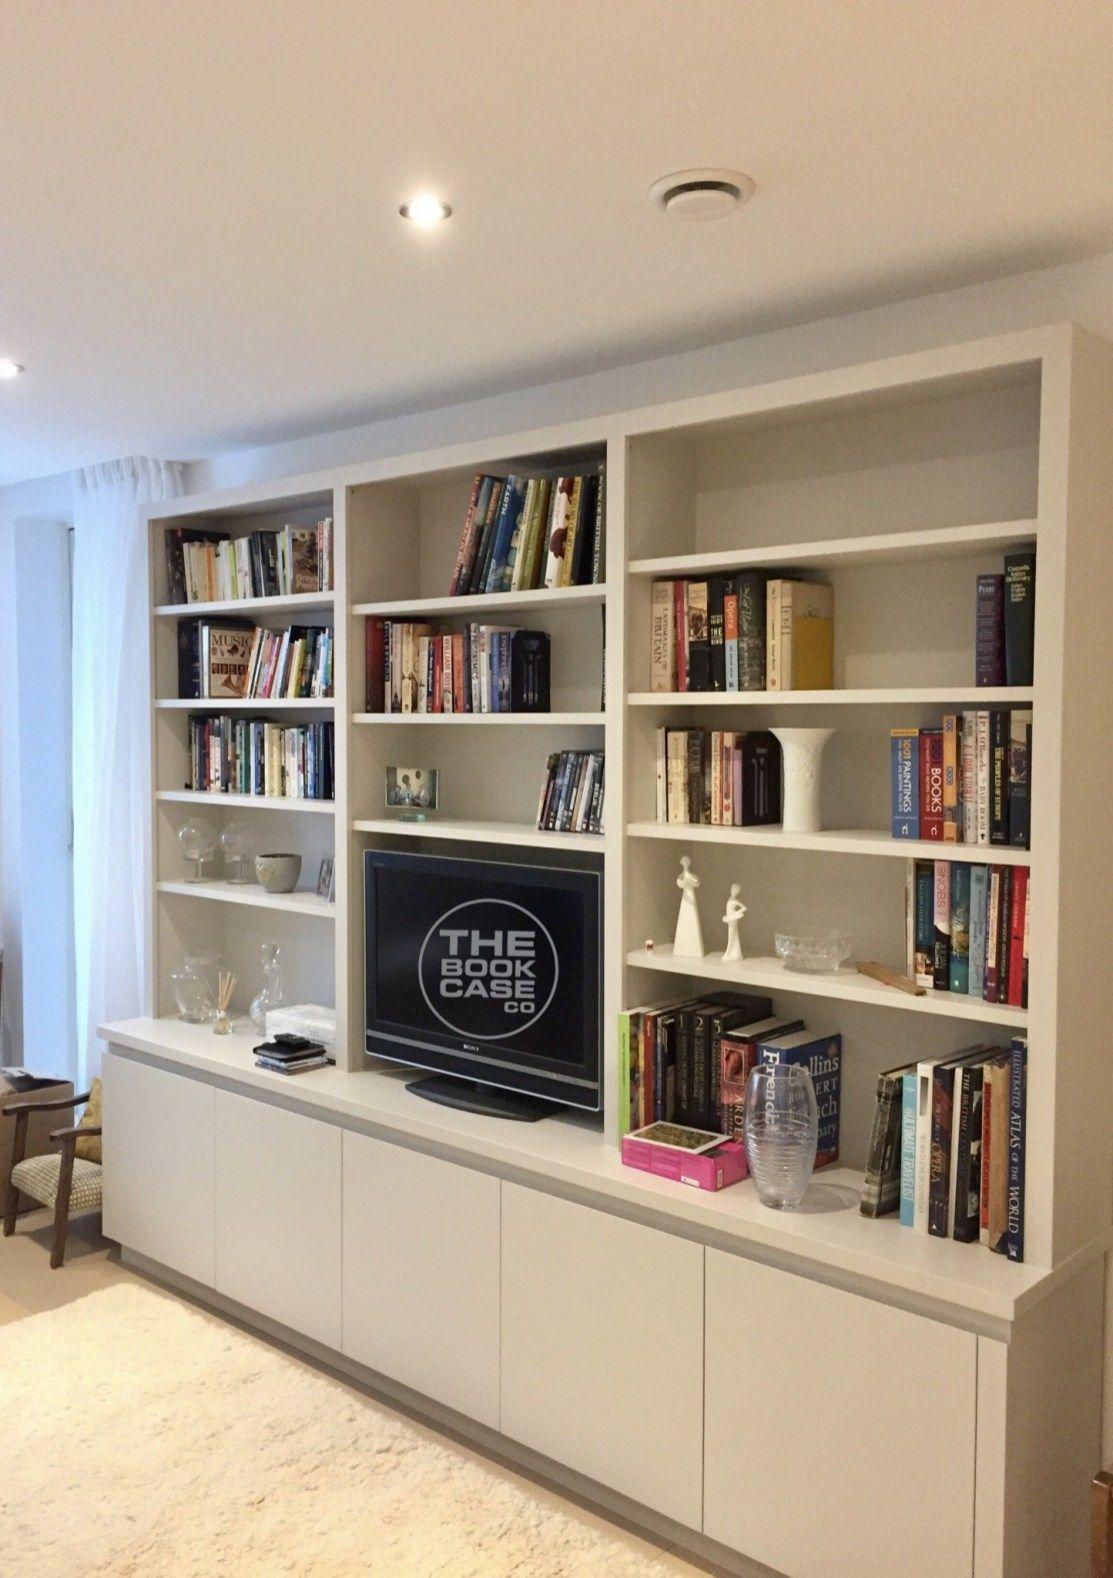 Media Furniture Shelving Units Living Room Wall Cabinets Living